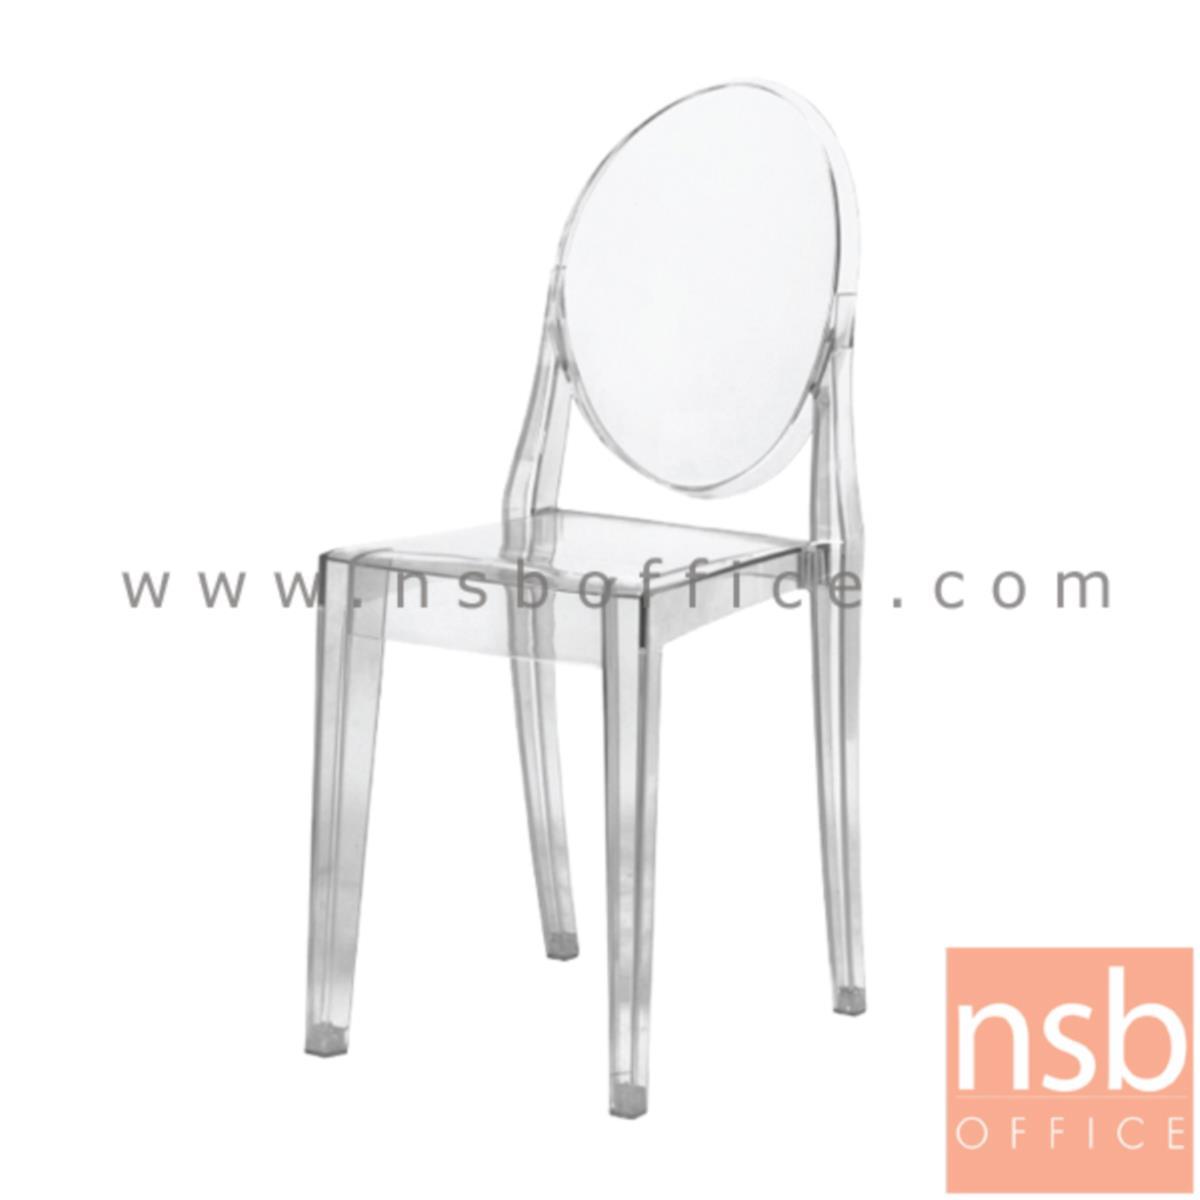 B29A078:เก้าอี้โมเดิร์นพลาสติก(PC)ล้วน รุ่น PP9220 ขนาด 38W cm.